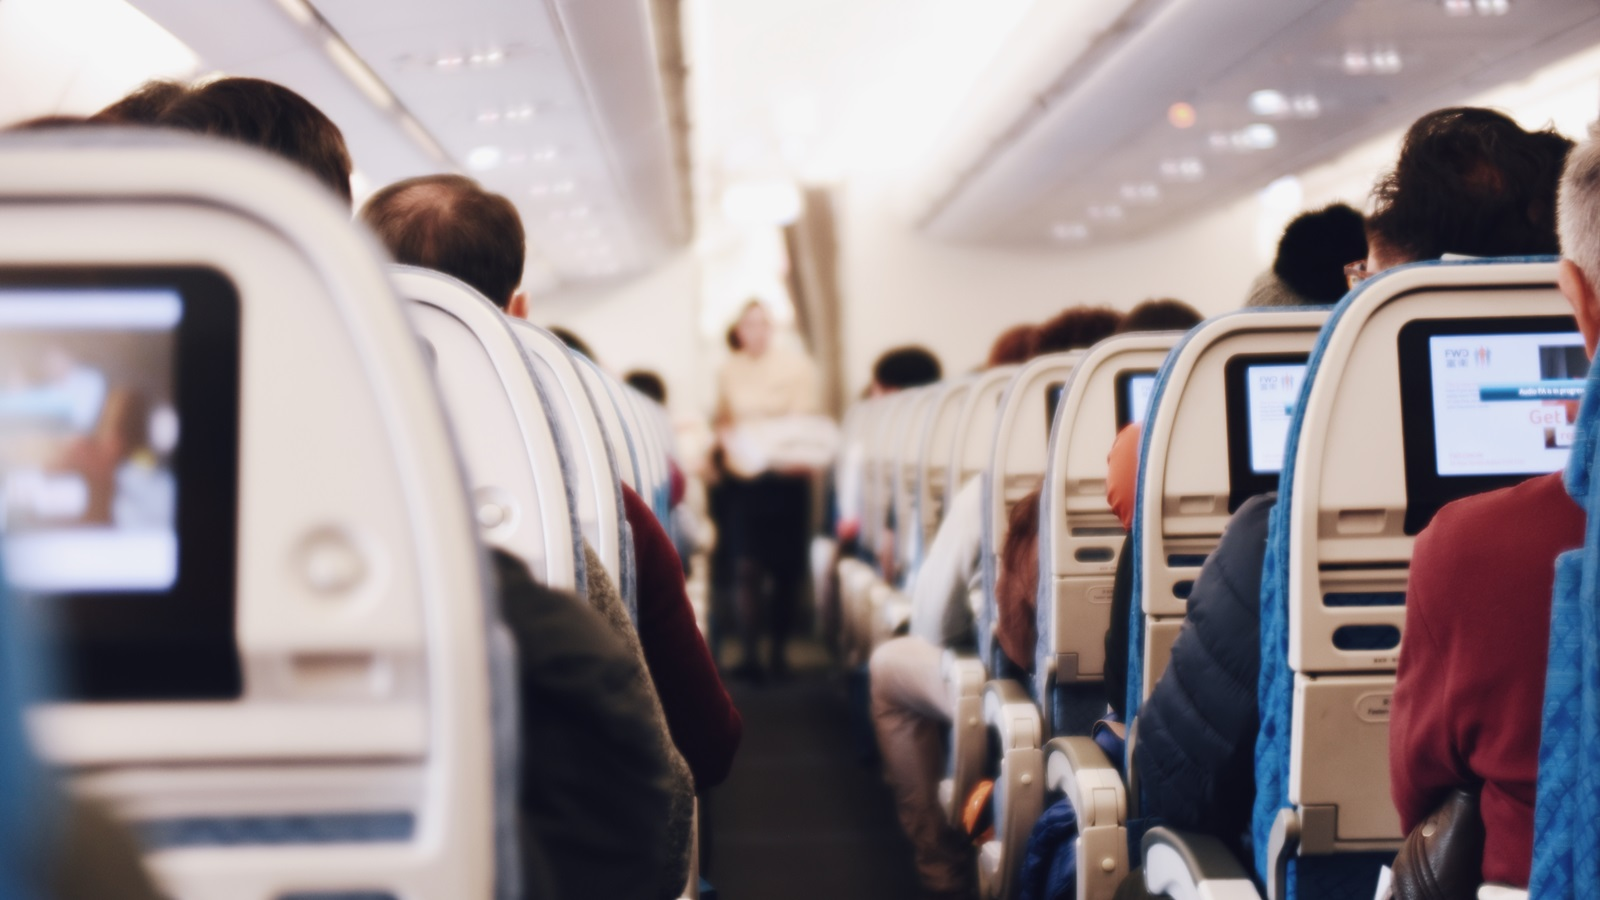 Aerolinky: Limity zavazadel, levné levné letenky, kontakty